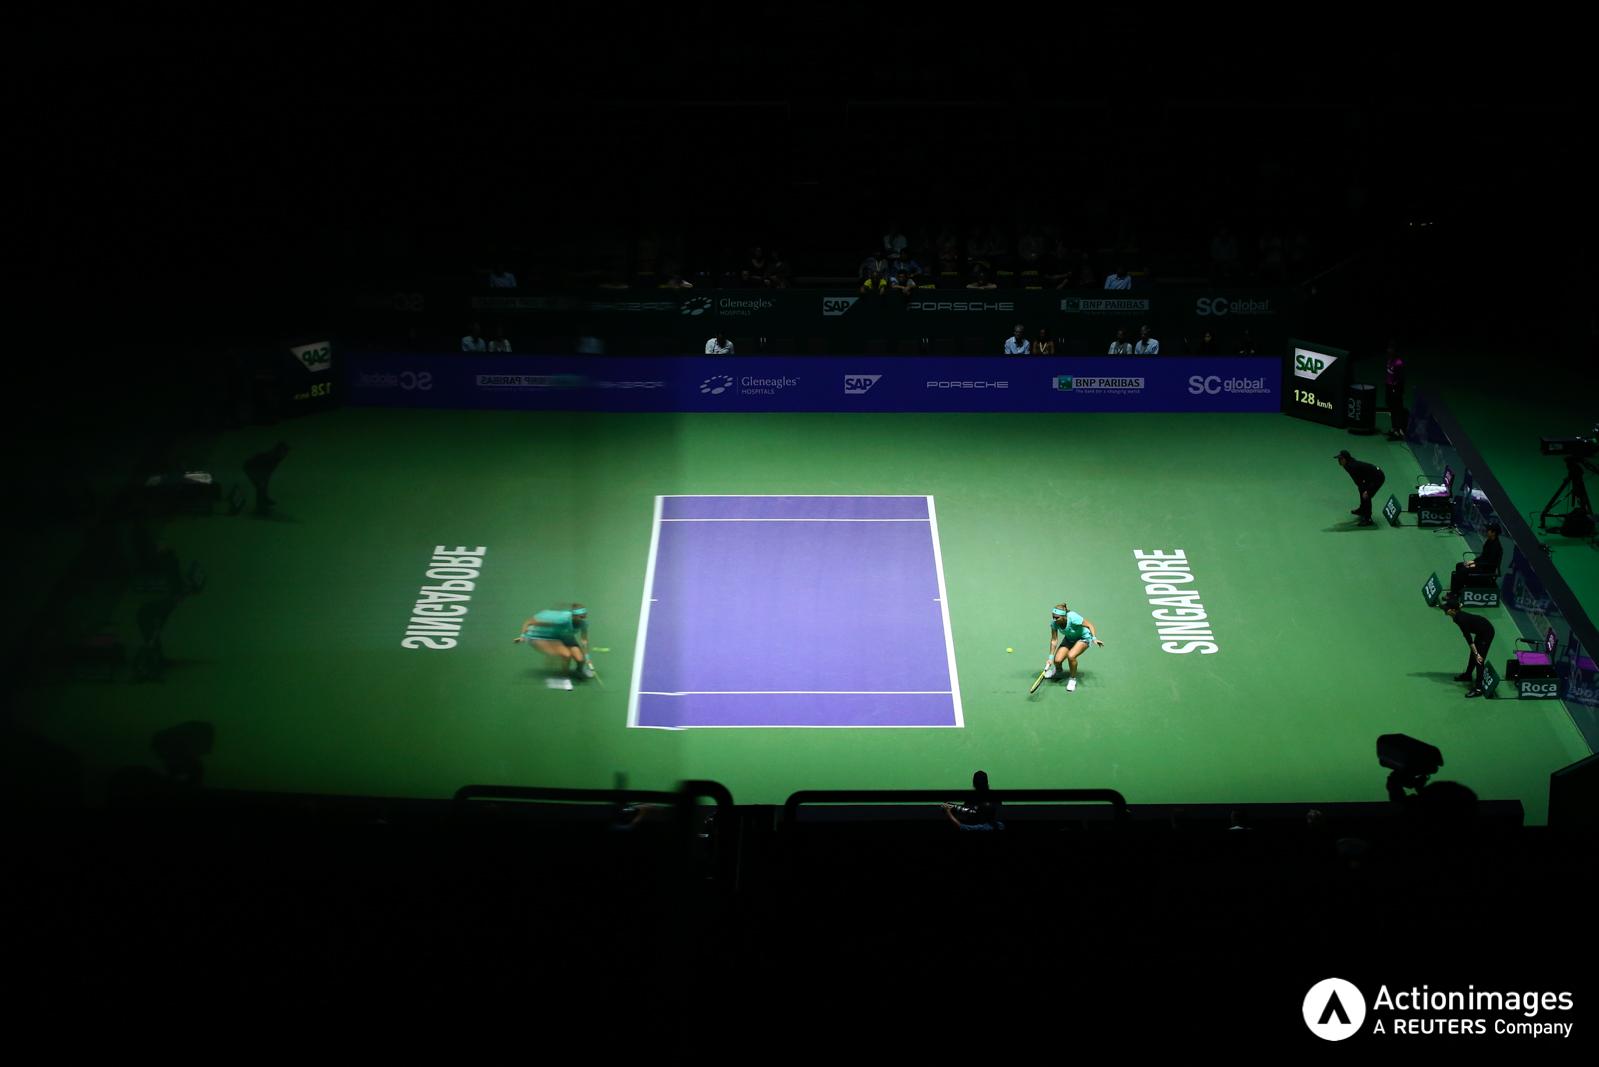 Tennis - BNP Paribas WTA Finals - Singapore Indoor Stadium - 26/10/16 Russia's Svetlana Kuznetsova in action during her round robin match Mandatory Credit: Action Images / Yong Teck Lim Livepic